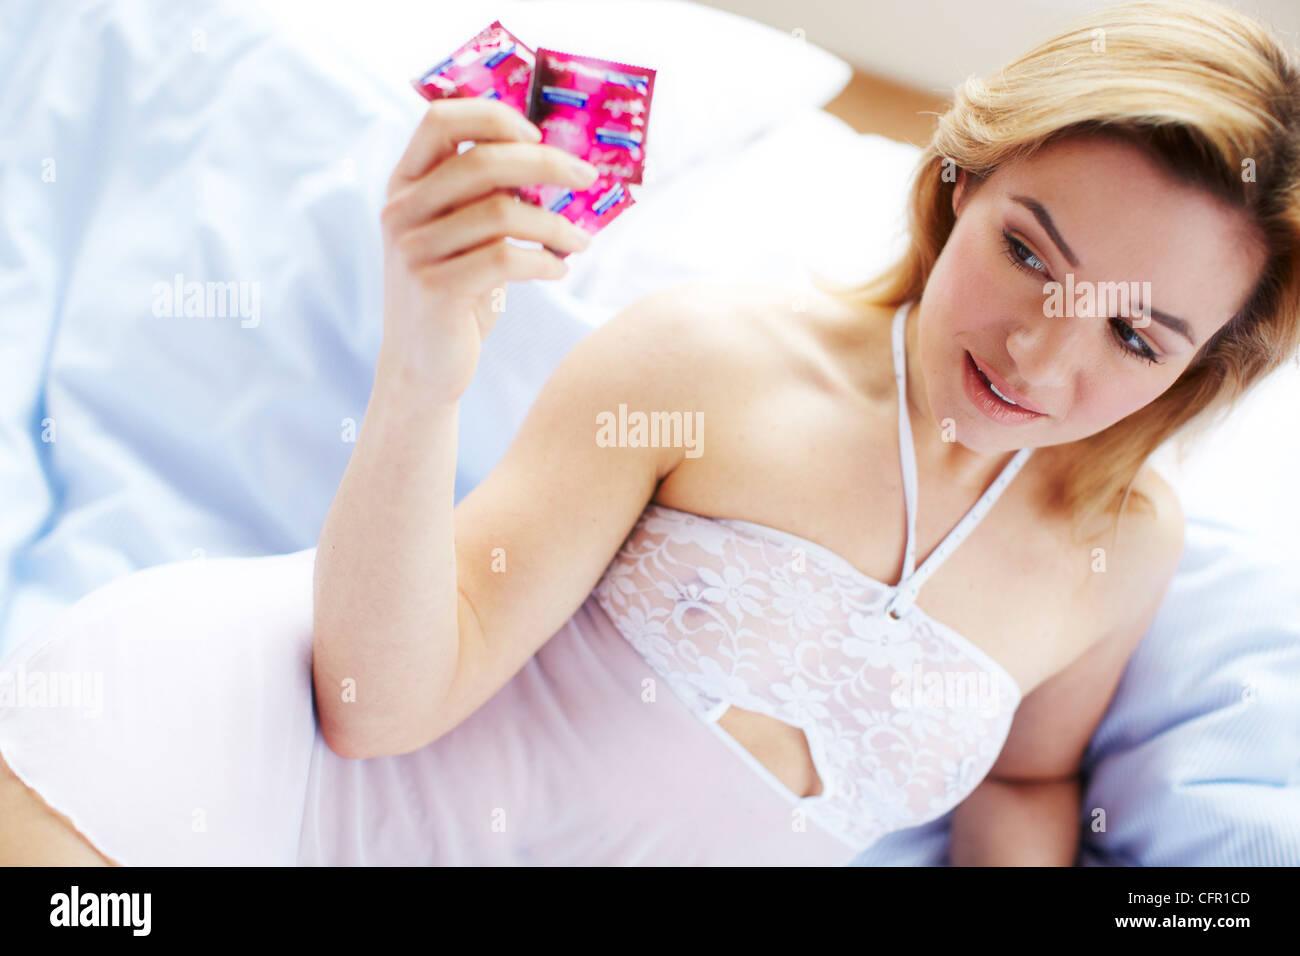 Condom in a girl